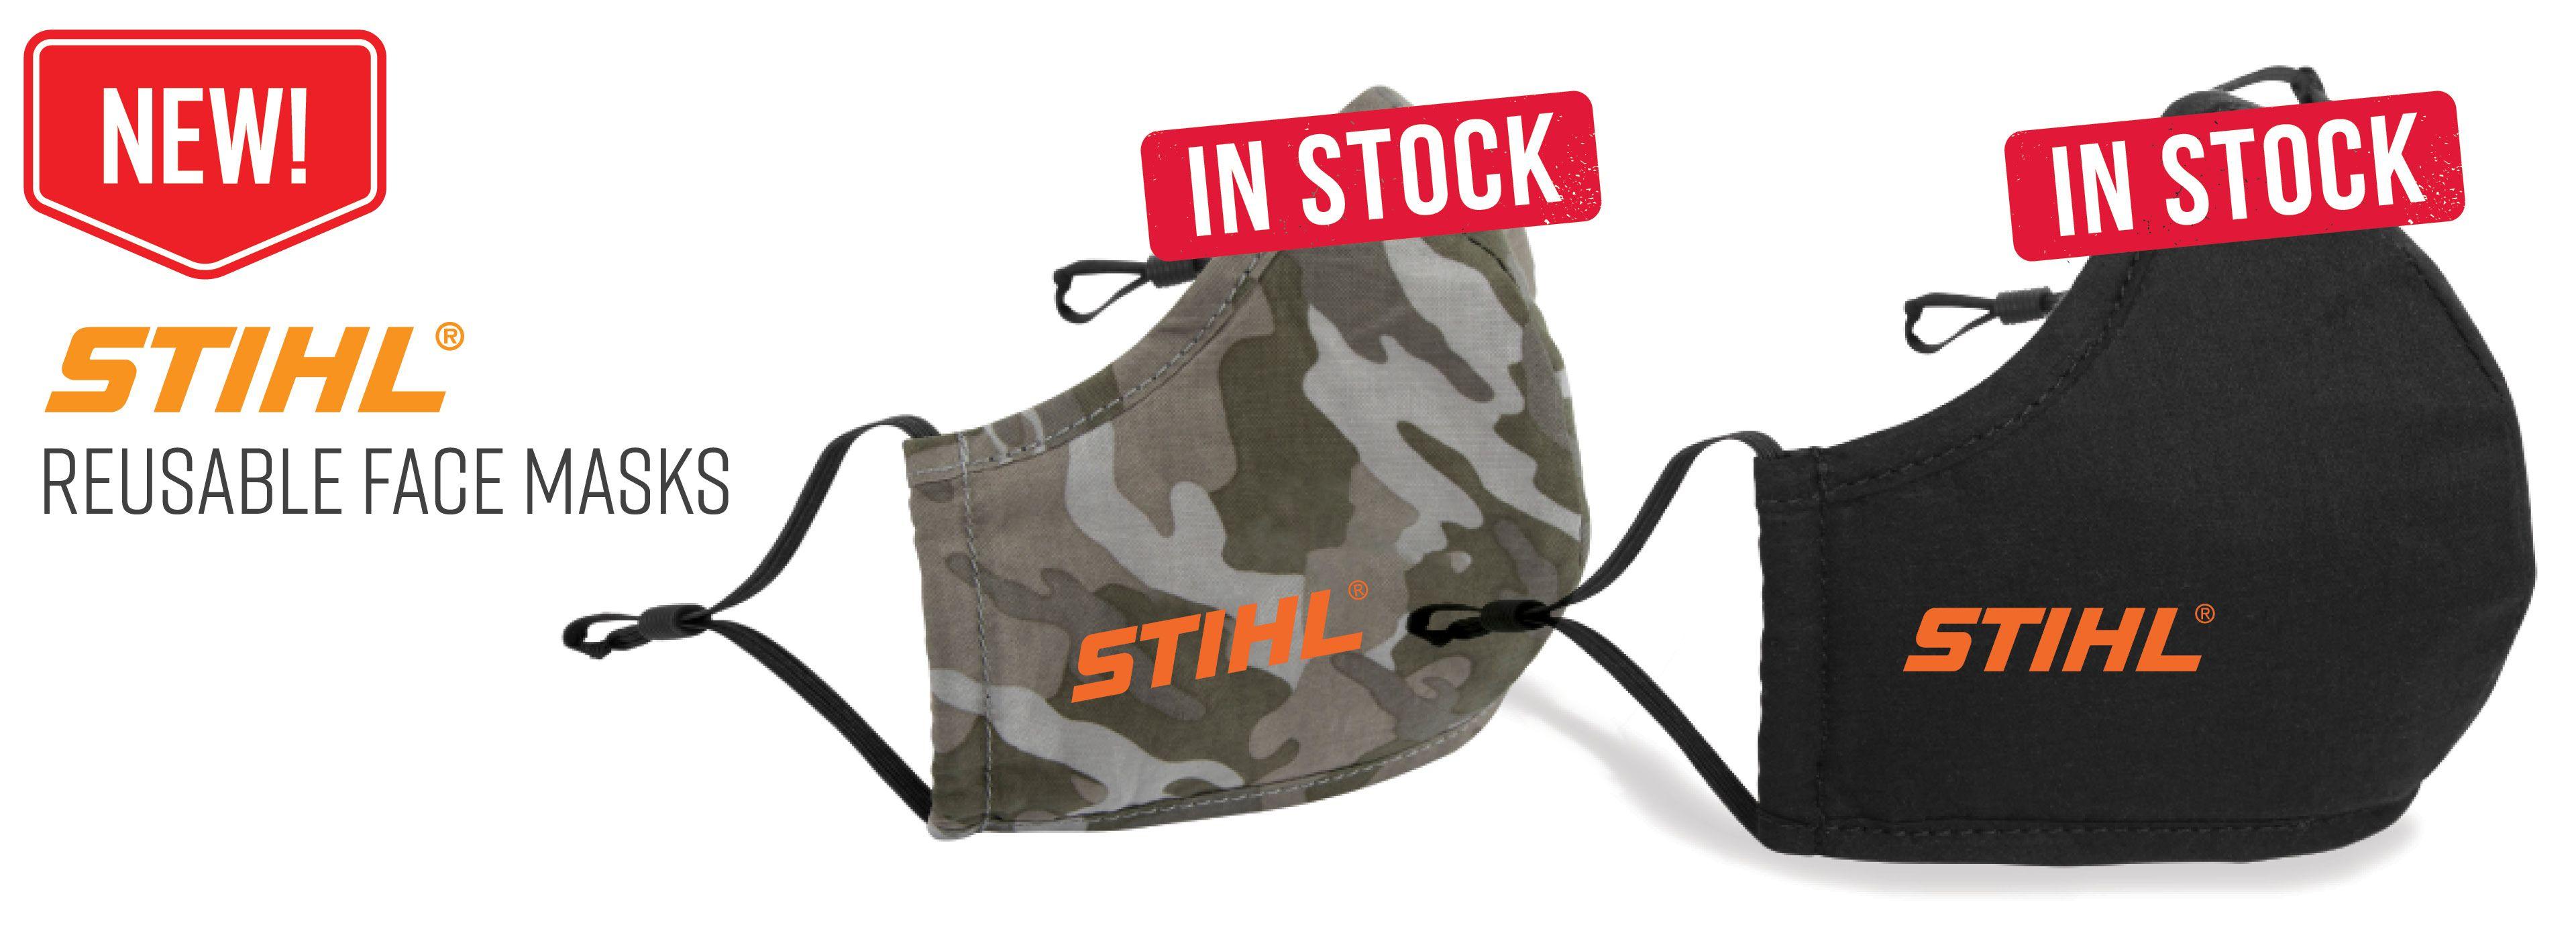 STIHL Masks IN STOCK